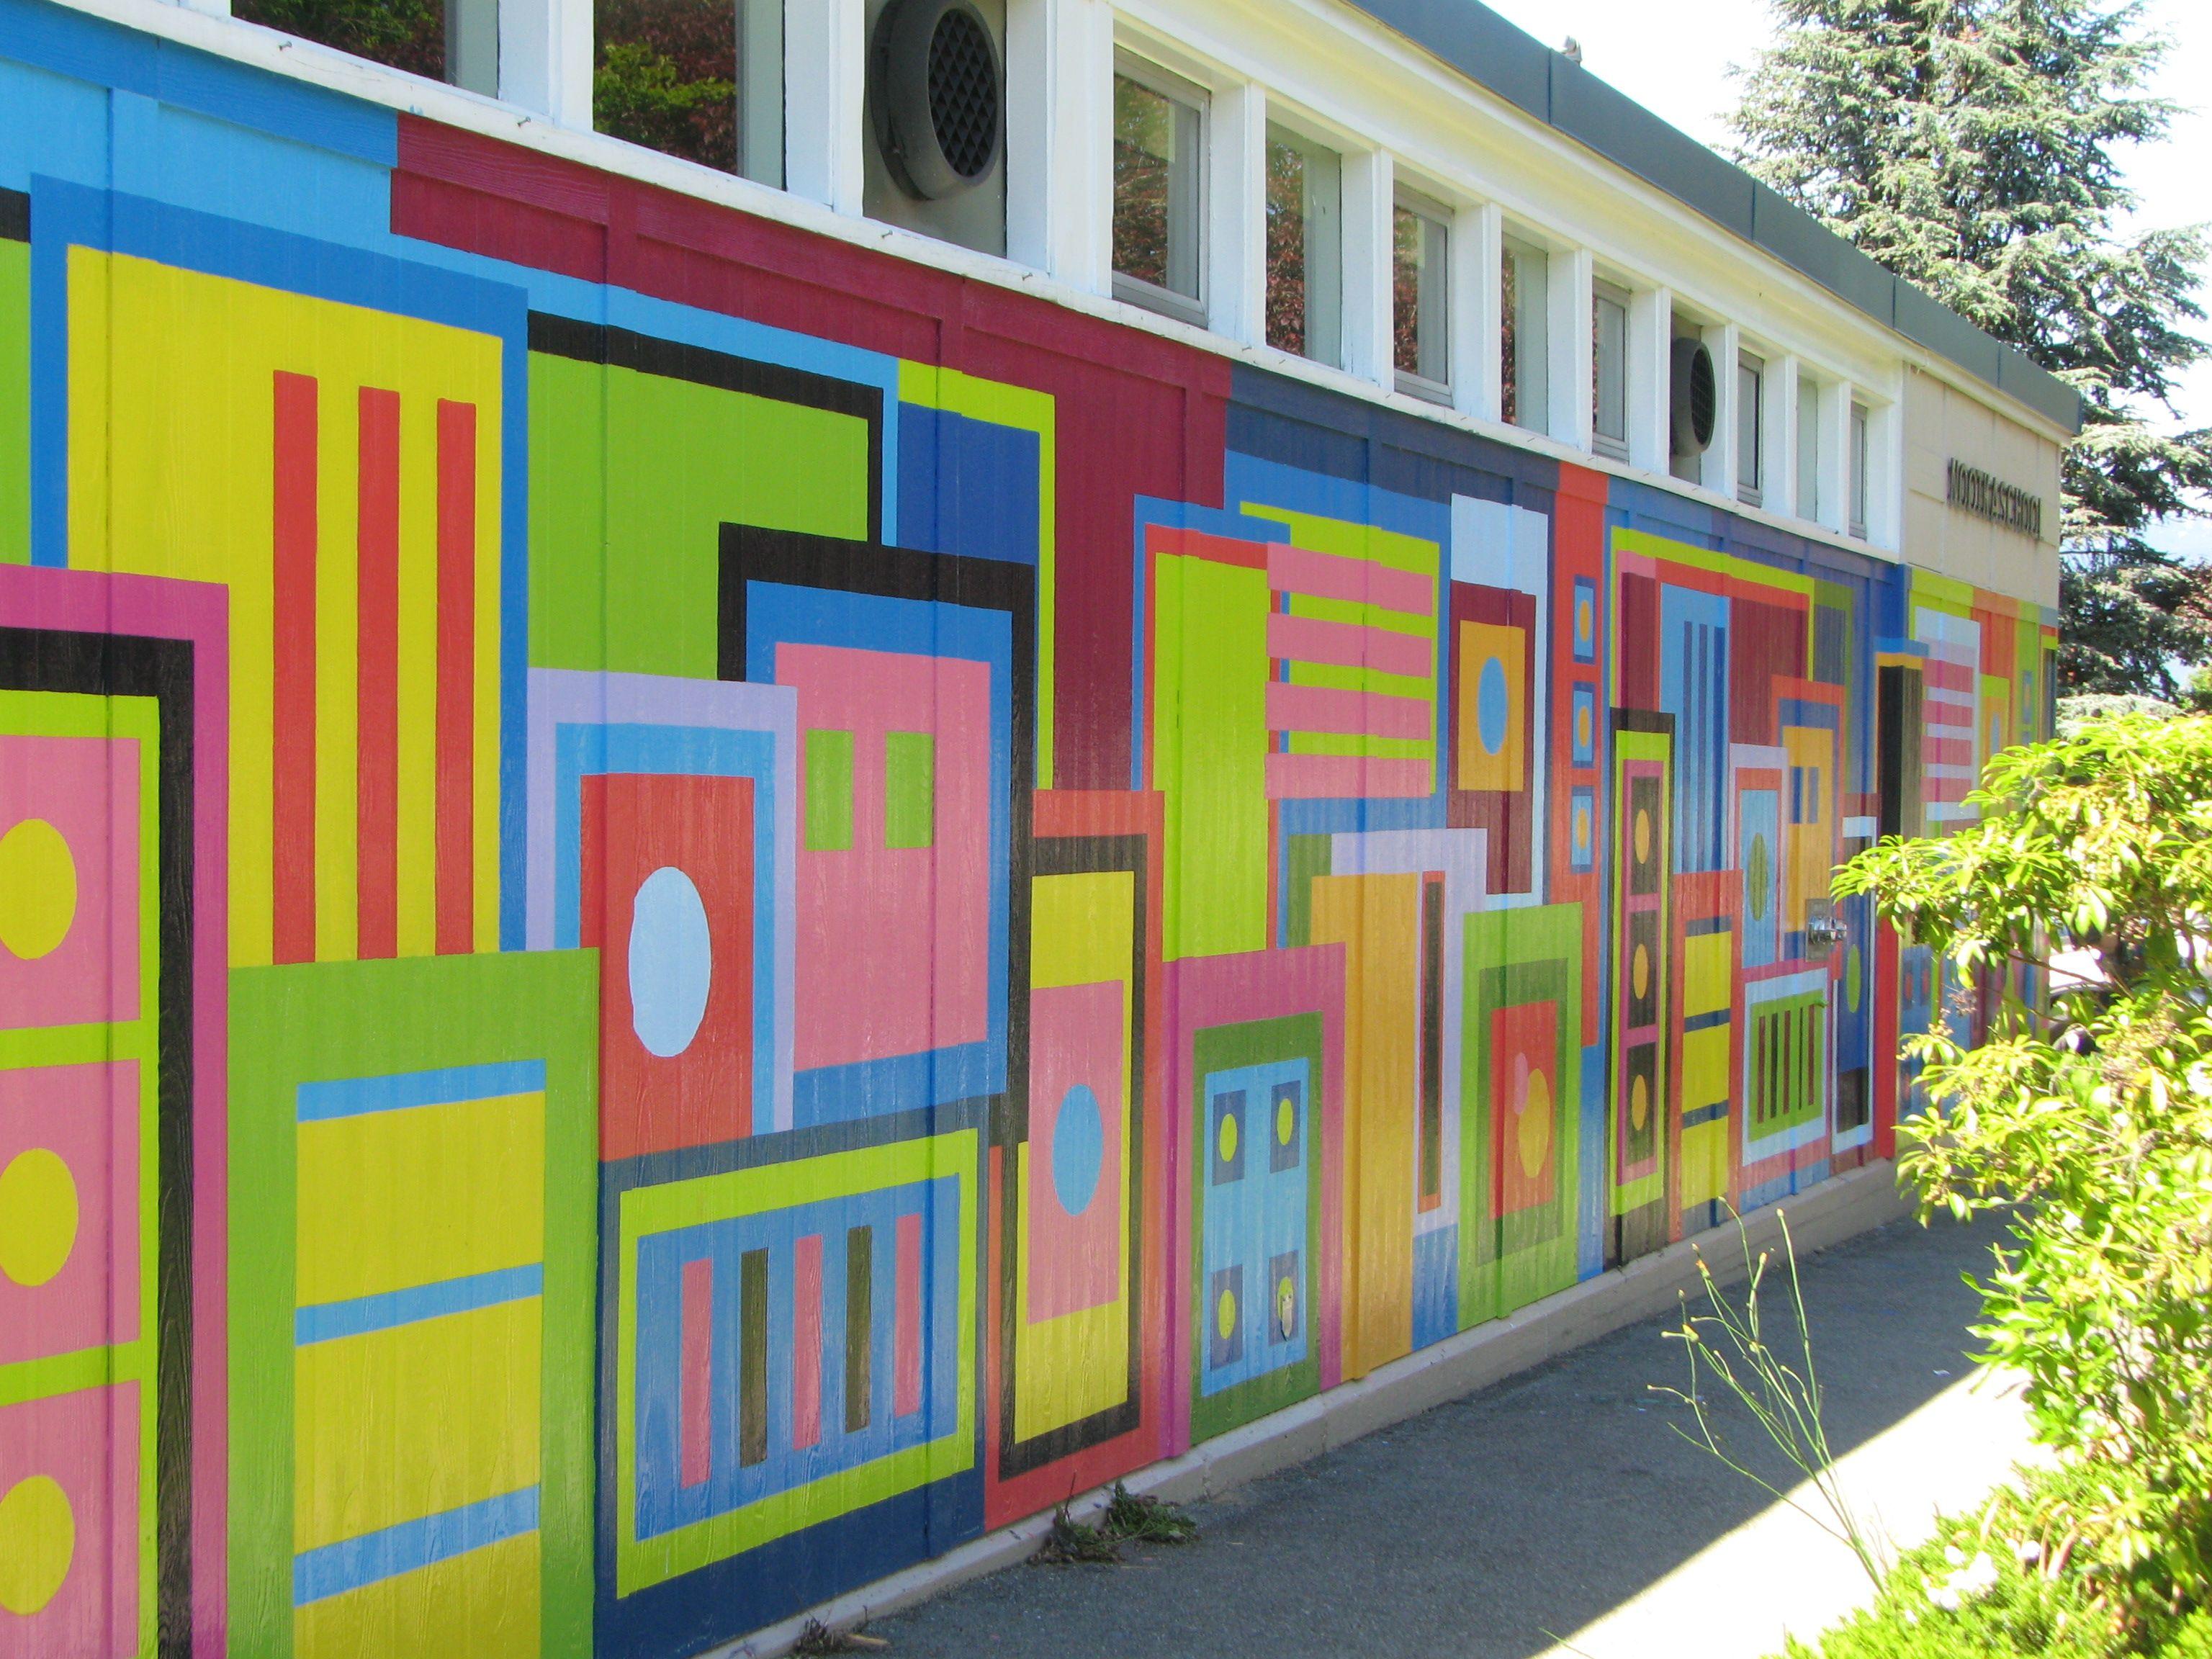 Mural Nootka Elementary School Vancouver Students